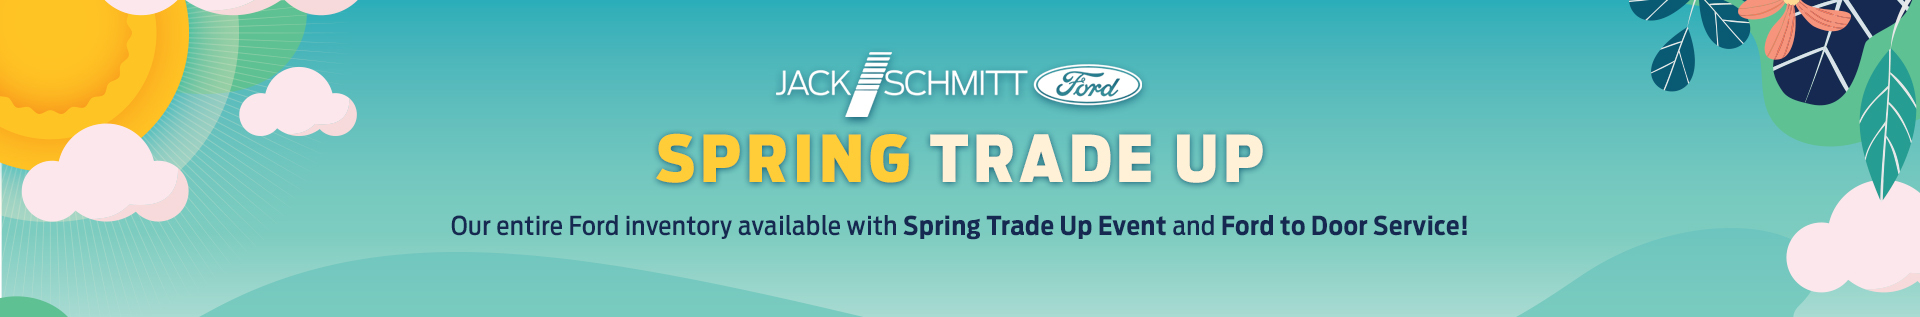 Spring Trade Up Srp